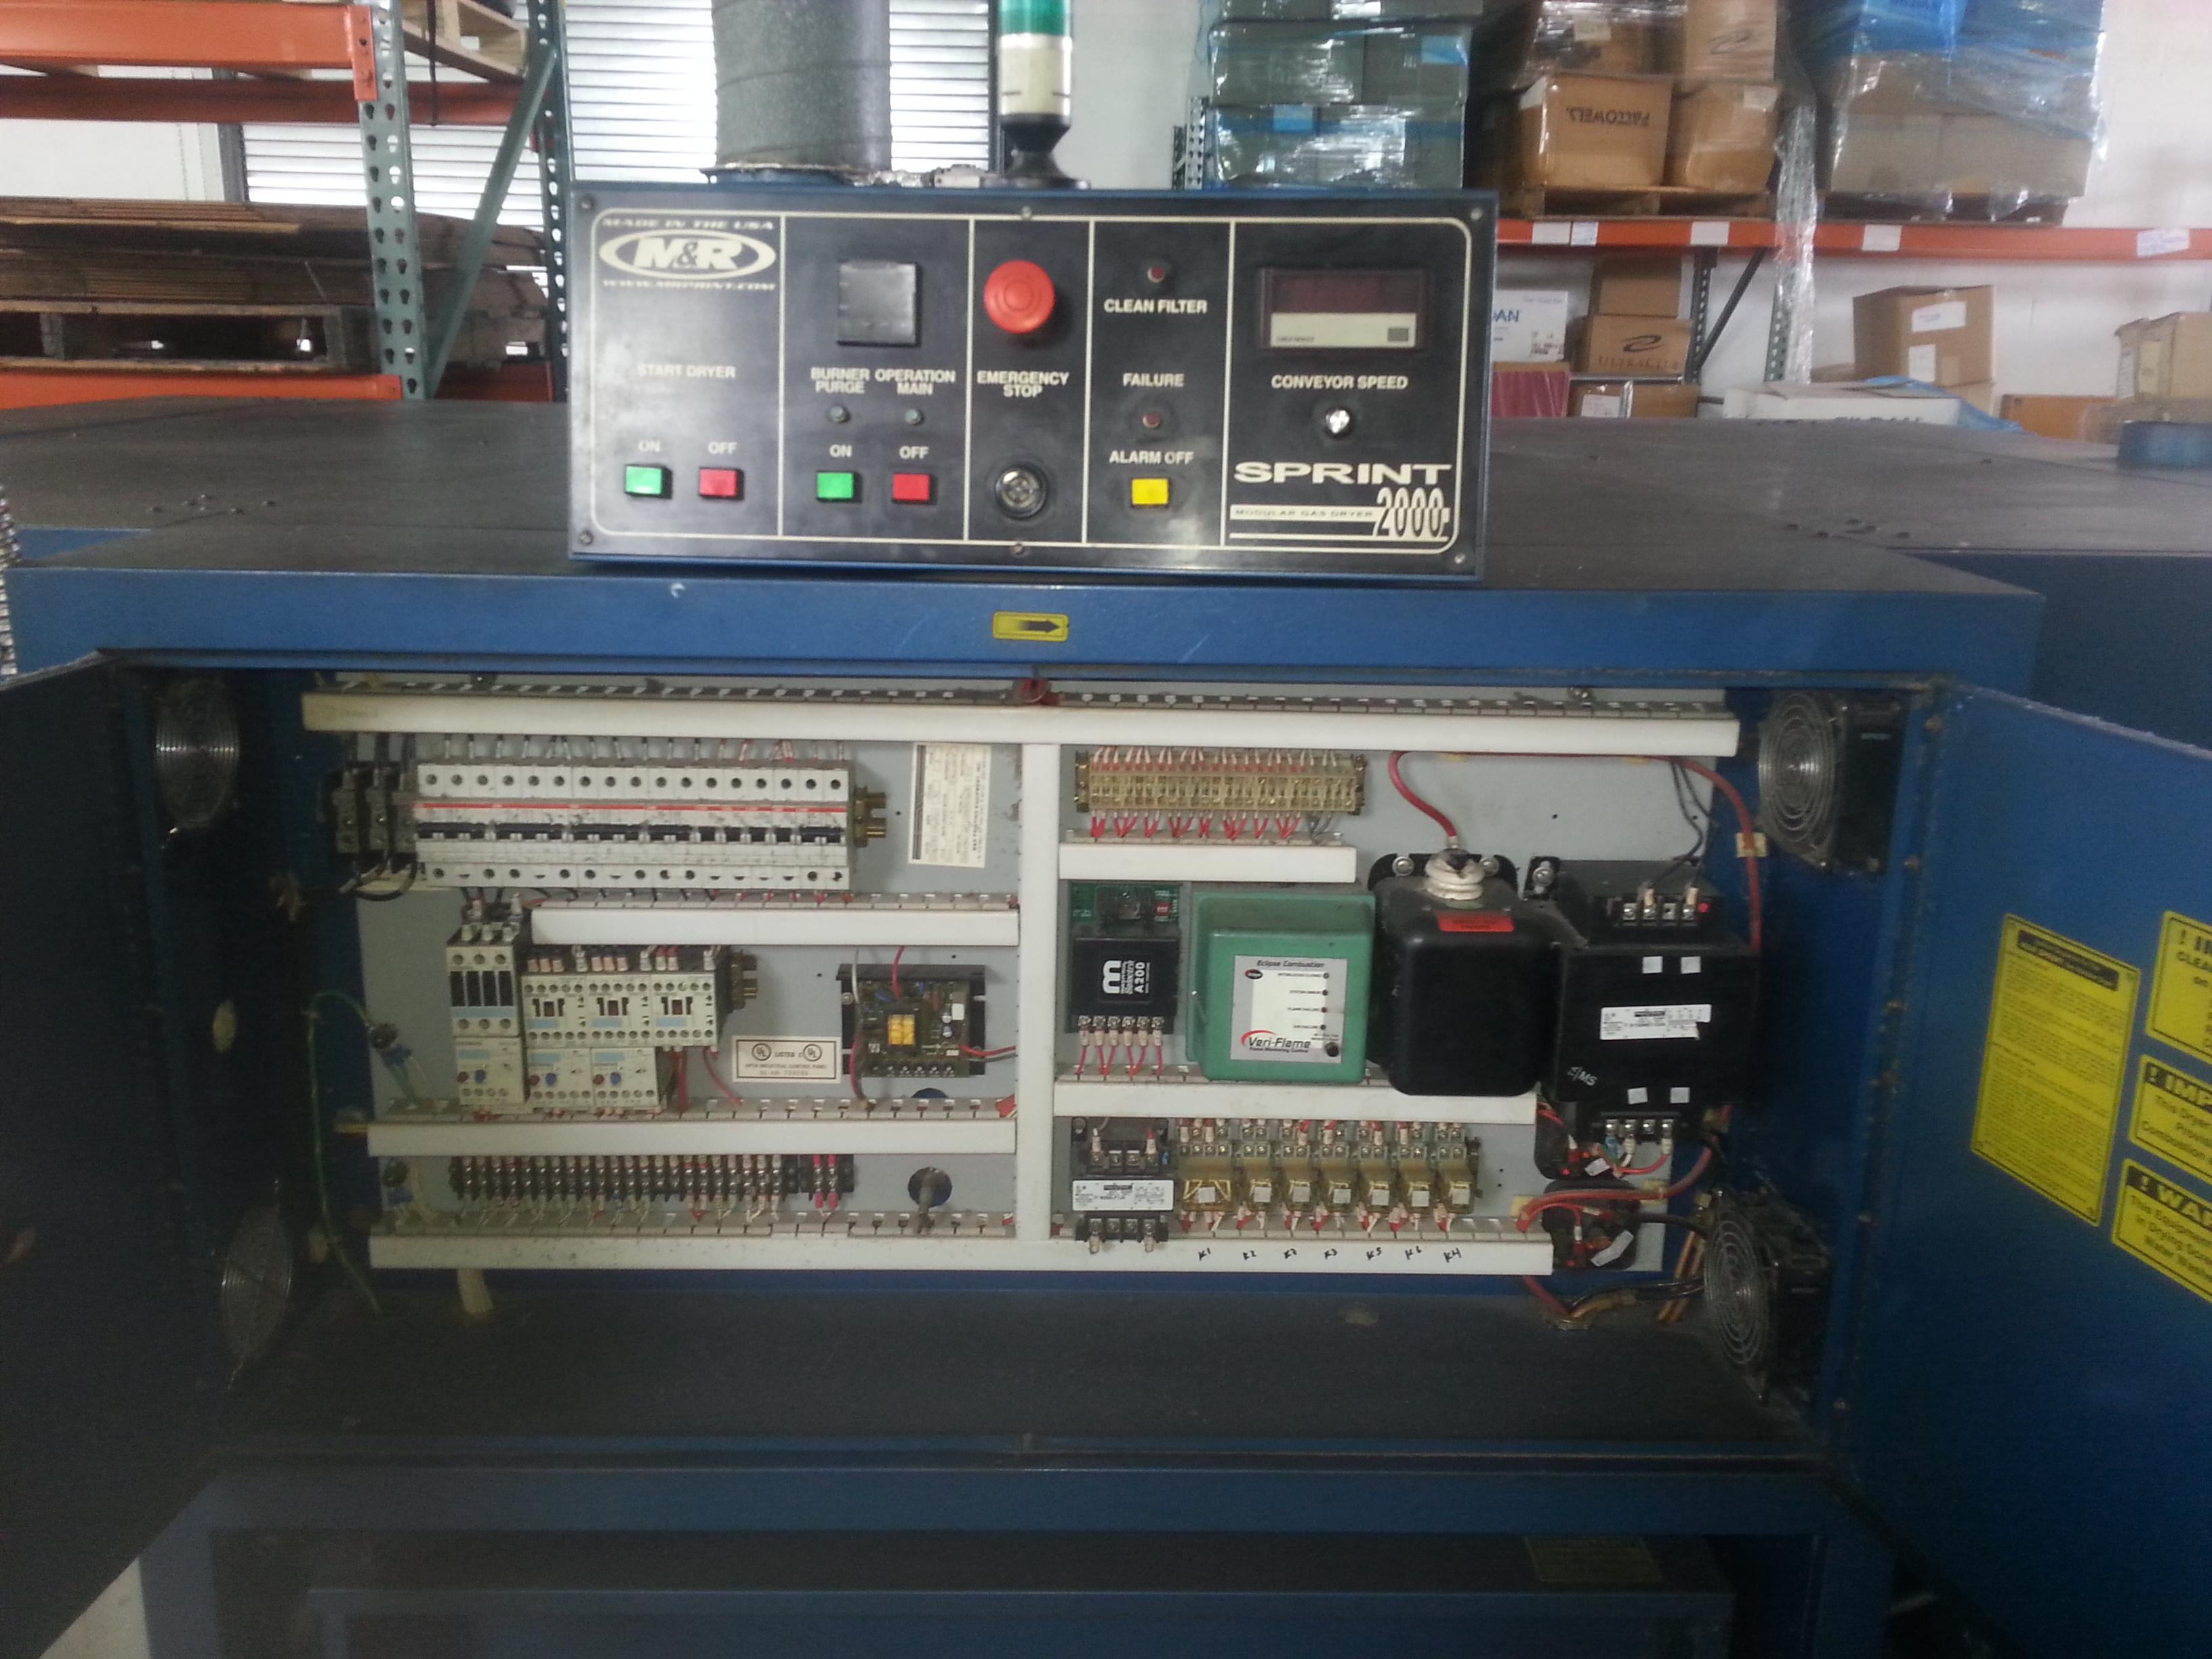 a sprint modular gas dryer for sale